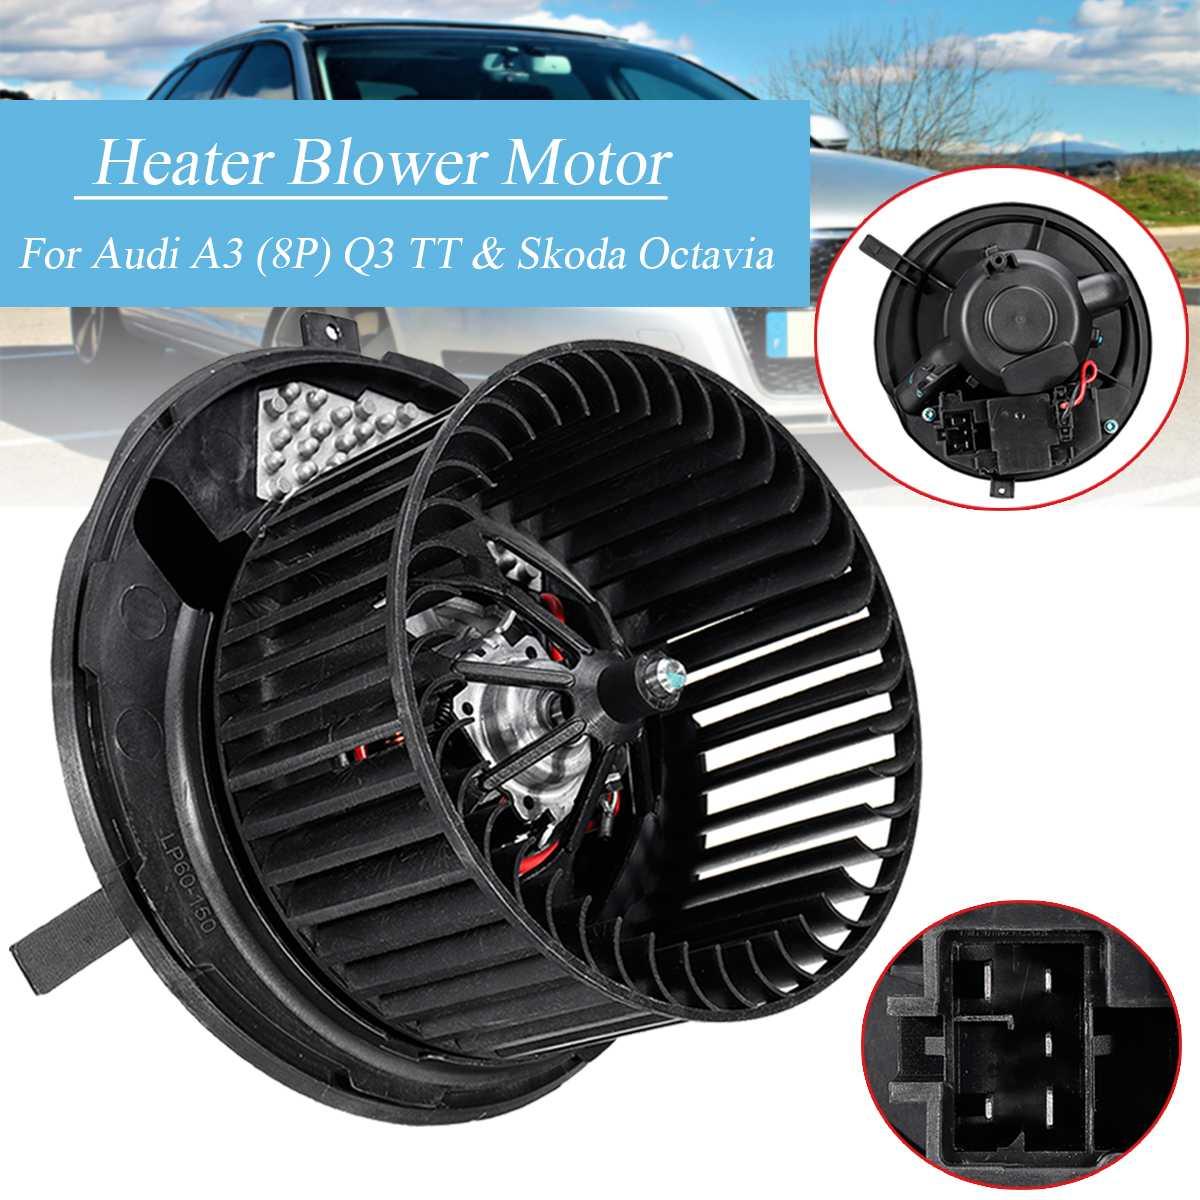 Car Heater Blower Fan Motor 1K2820015 1K2820015H For Skoda Octavia Superb/Yeti/Audi A3 TT Q3 CC